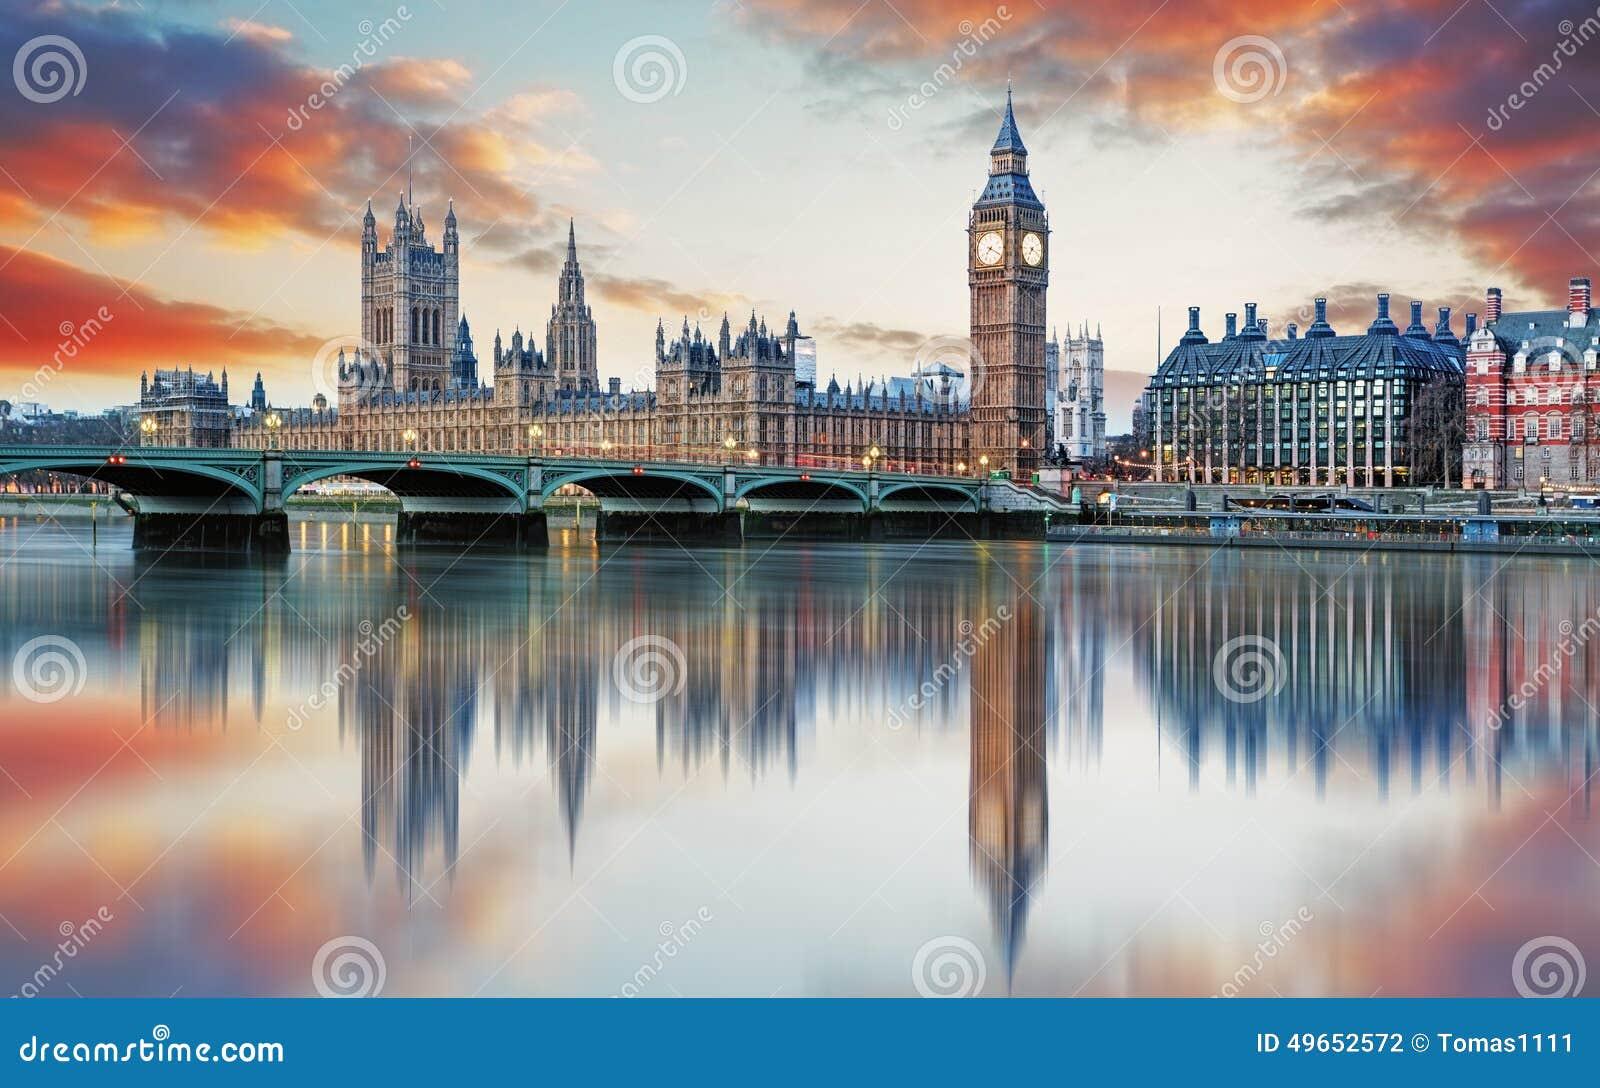 Londyn - big ben i domy parlament UK,